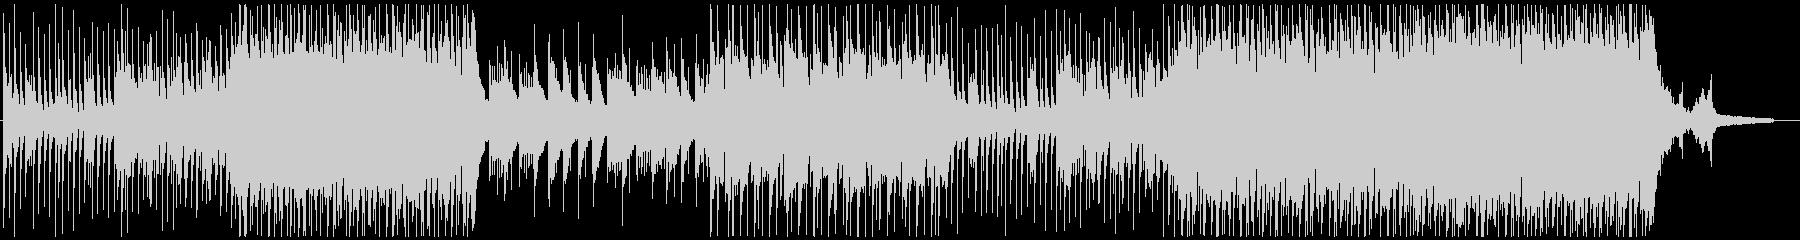 Mistrain / MAIN THEME's unreproduced waveform